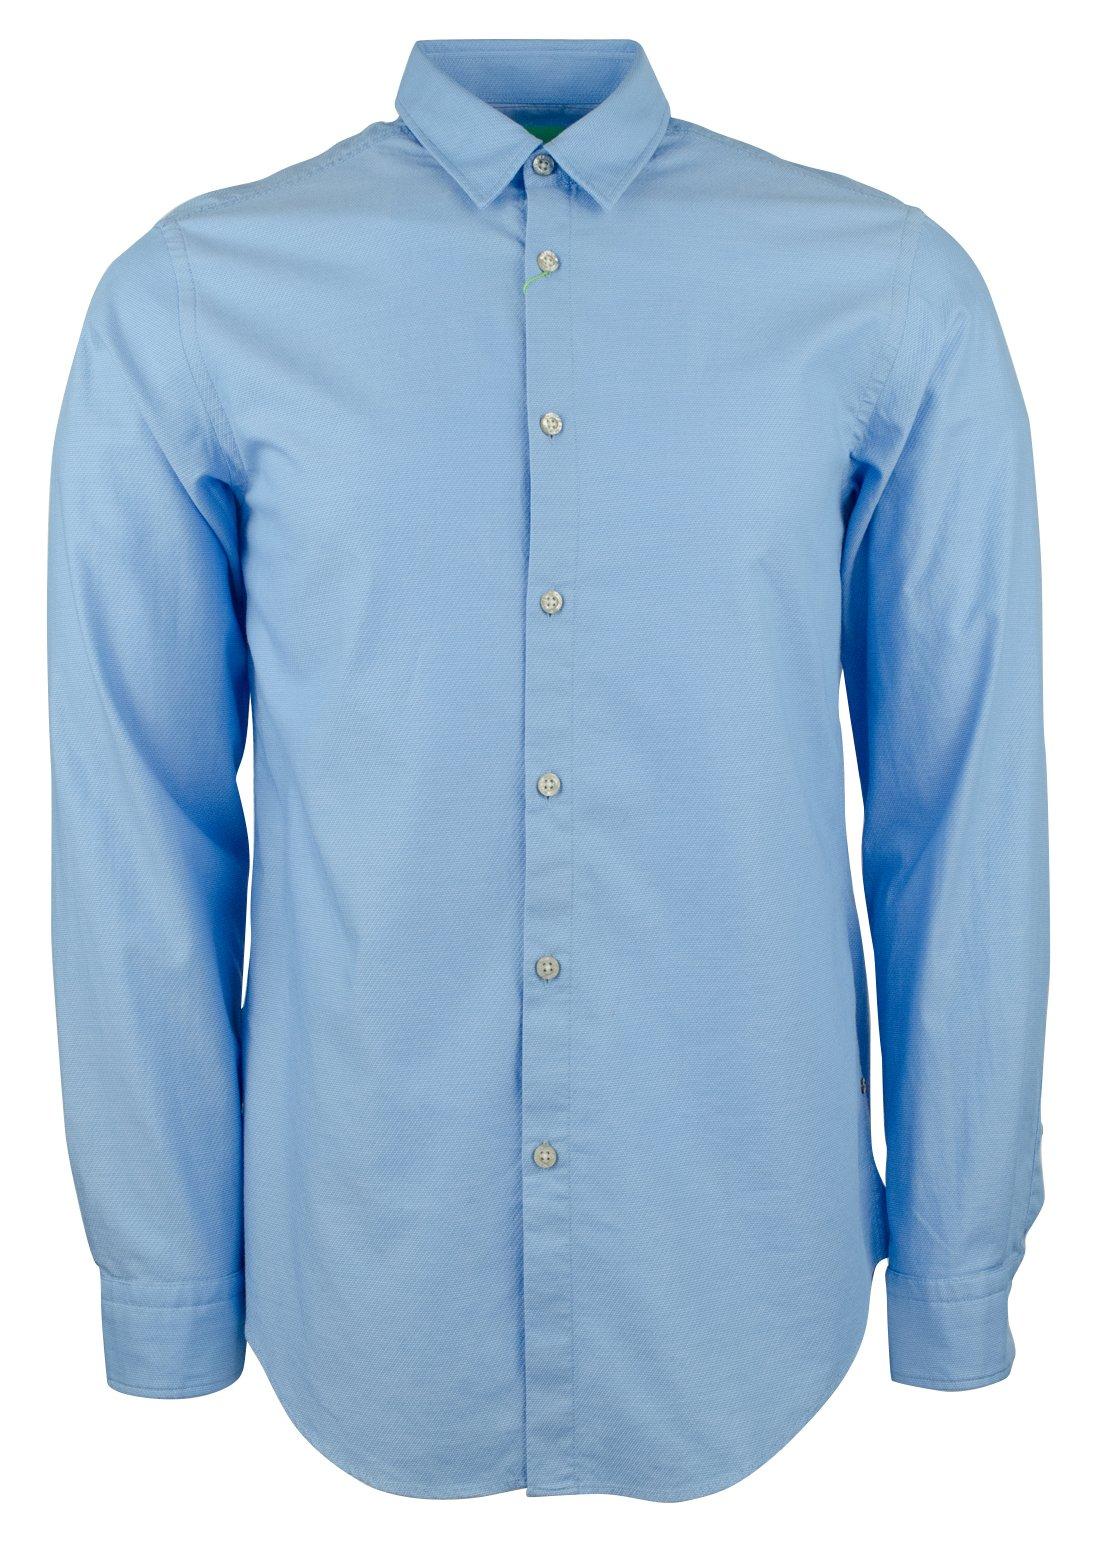 Hugo Boss Men's Green Label C-Bustai Regular Fit Patterned Shirt-B-XL